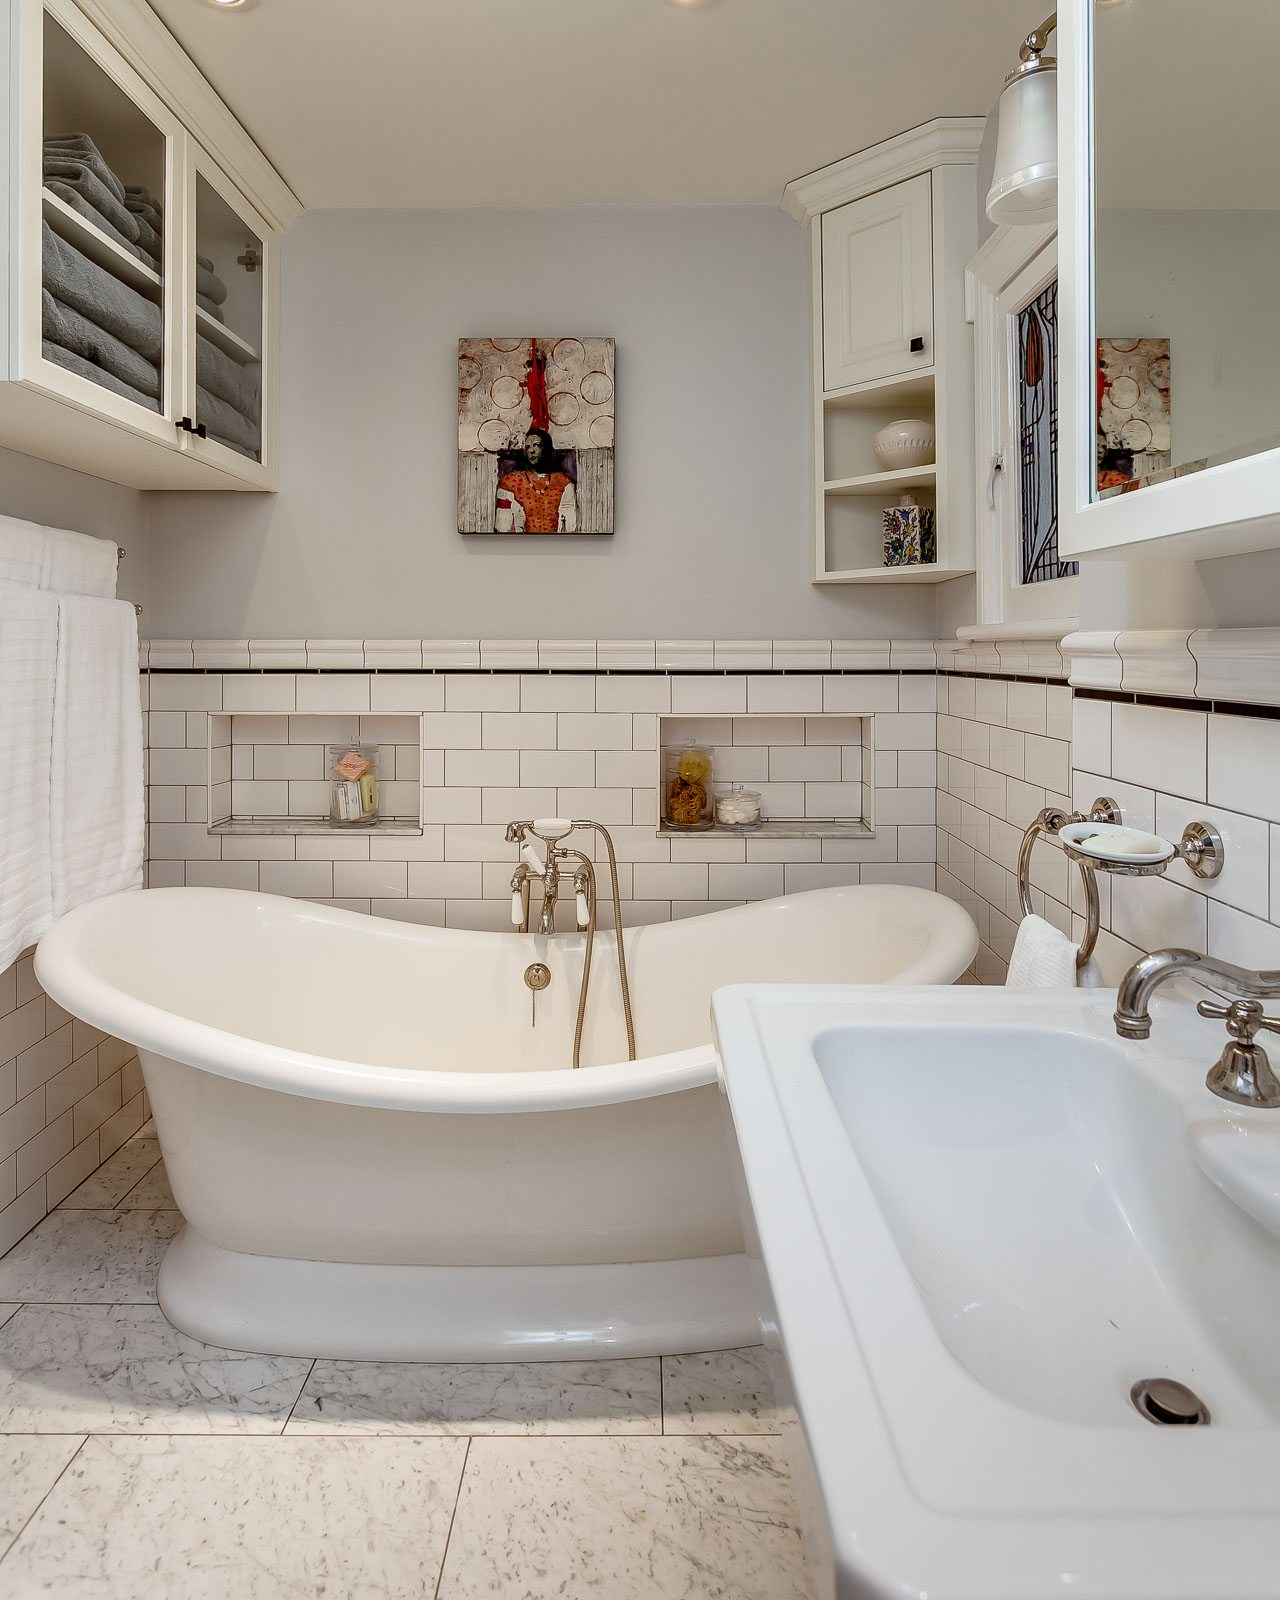 toronto-house-sold-223-wright-avenue-10